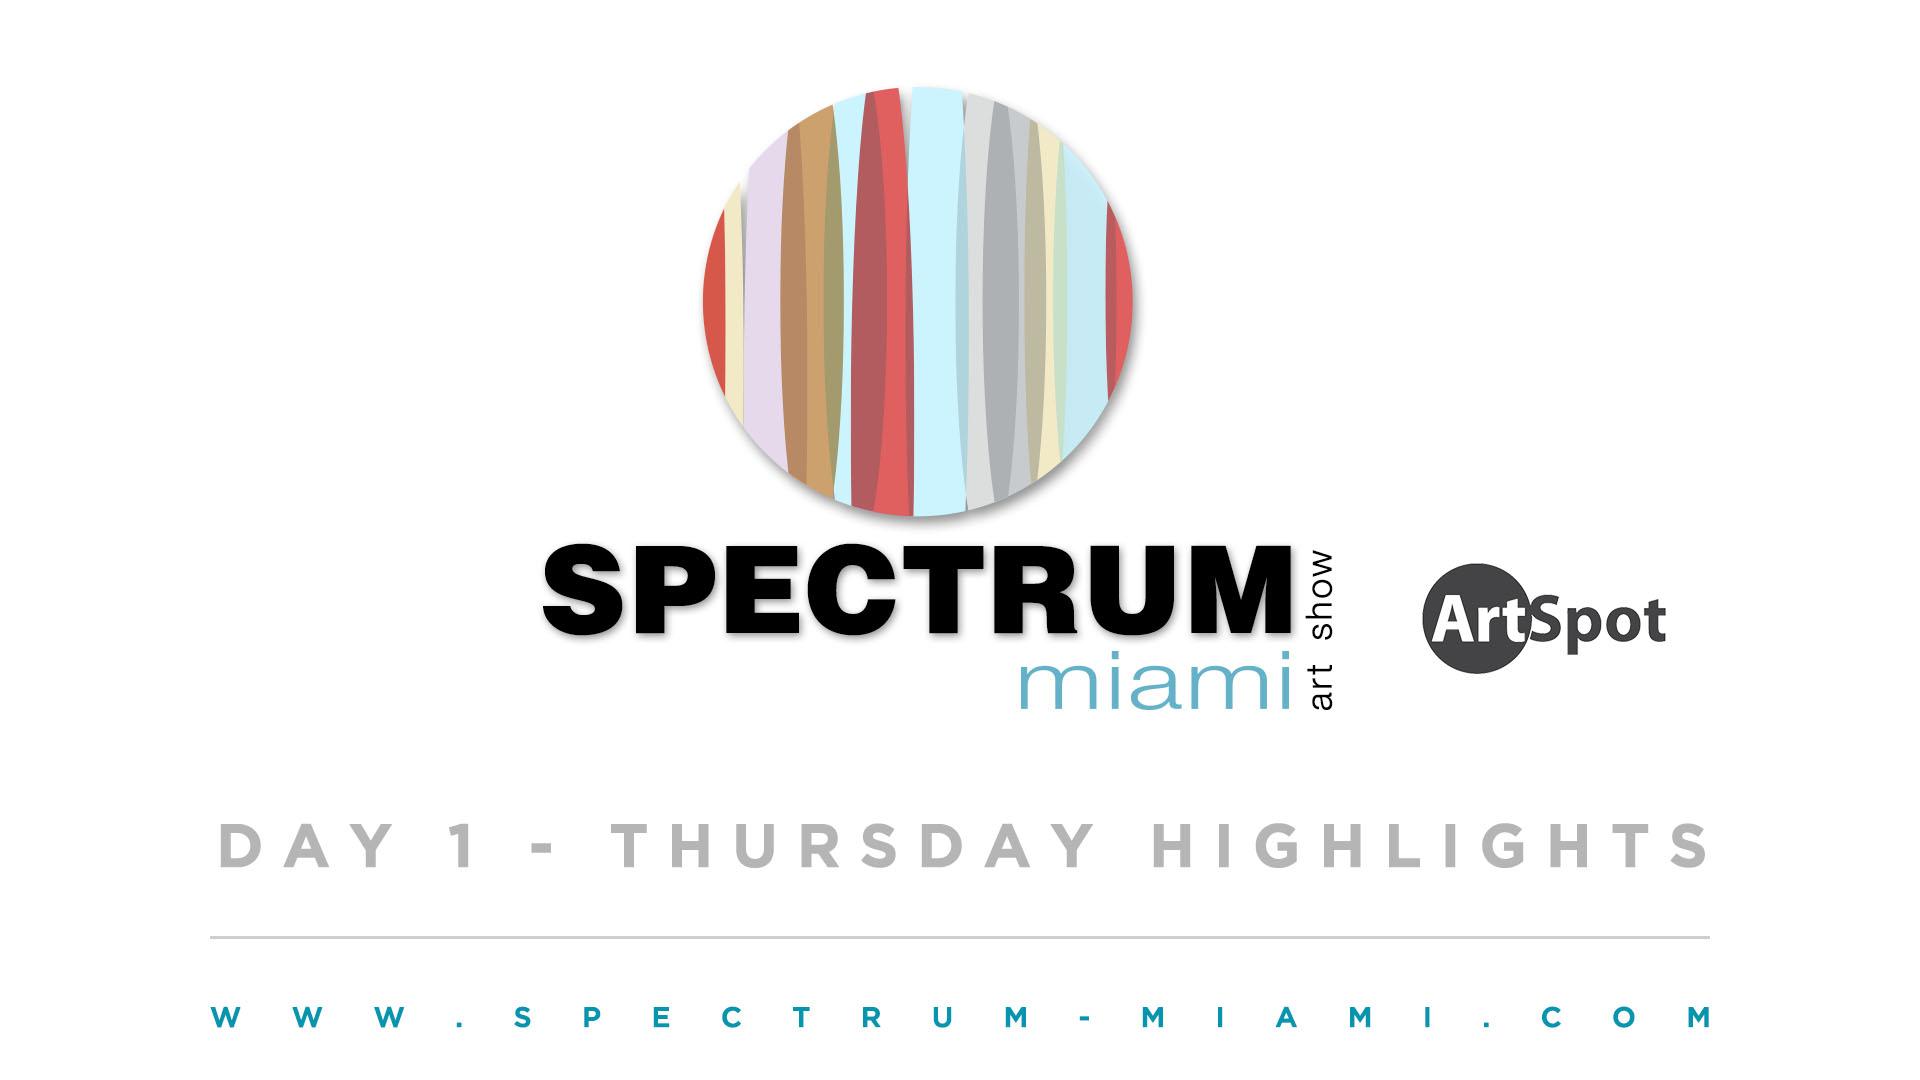 Spectrum Miami 2016 - Thursday Highlights